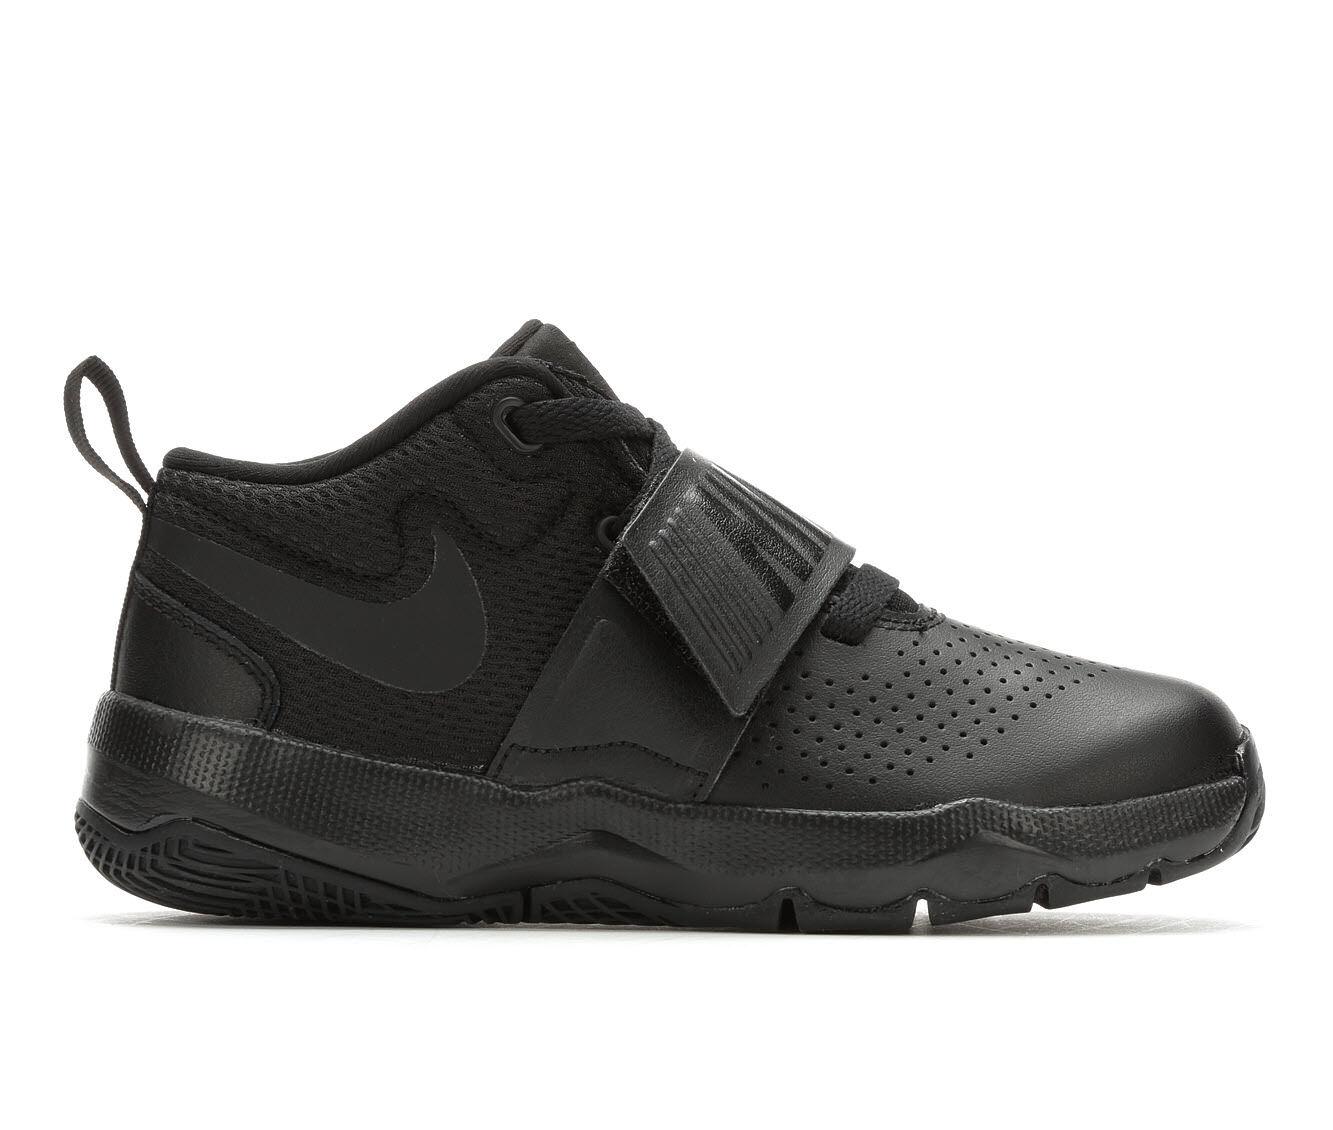 Boys' Nike Team Hustle D8 3 High Top Basketball Shoes